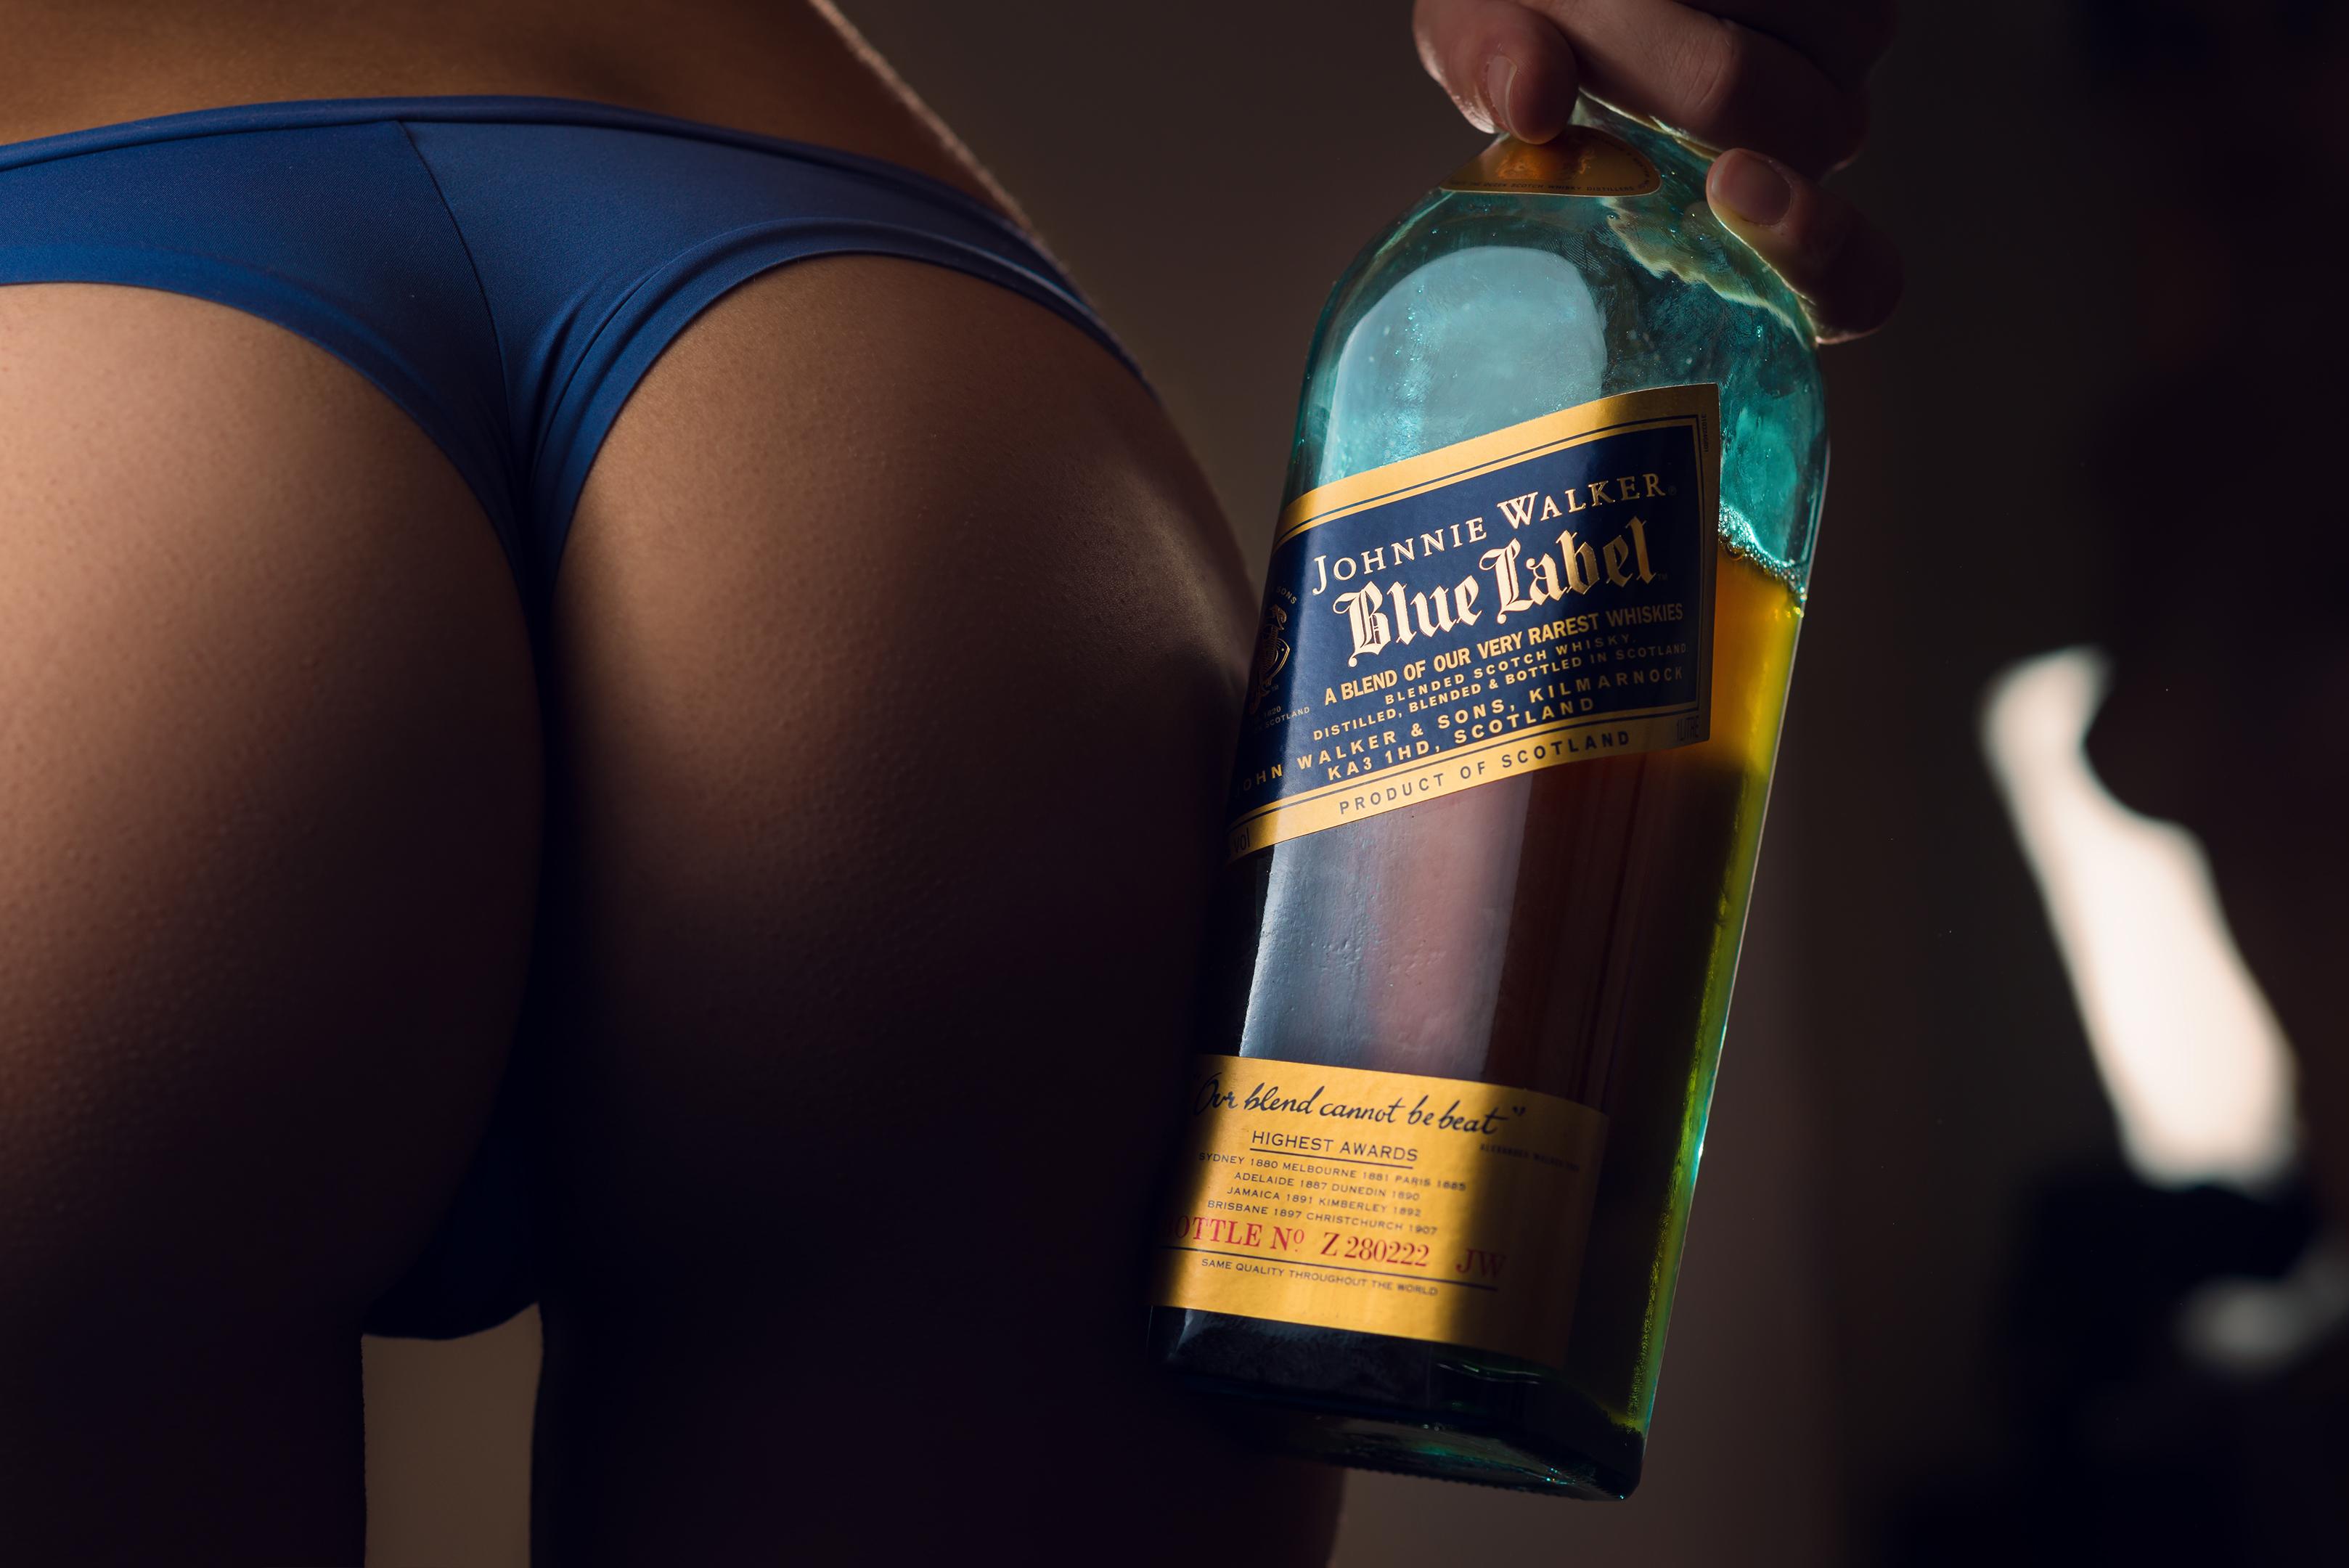 Бутылка в стройной попе блондинки фото небритую киску